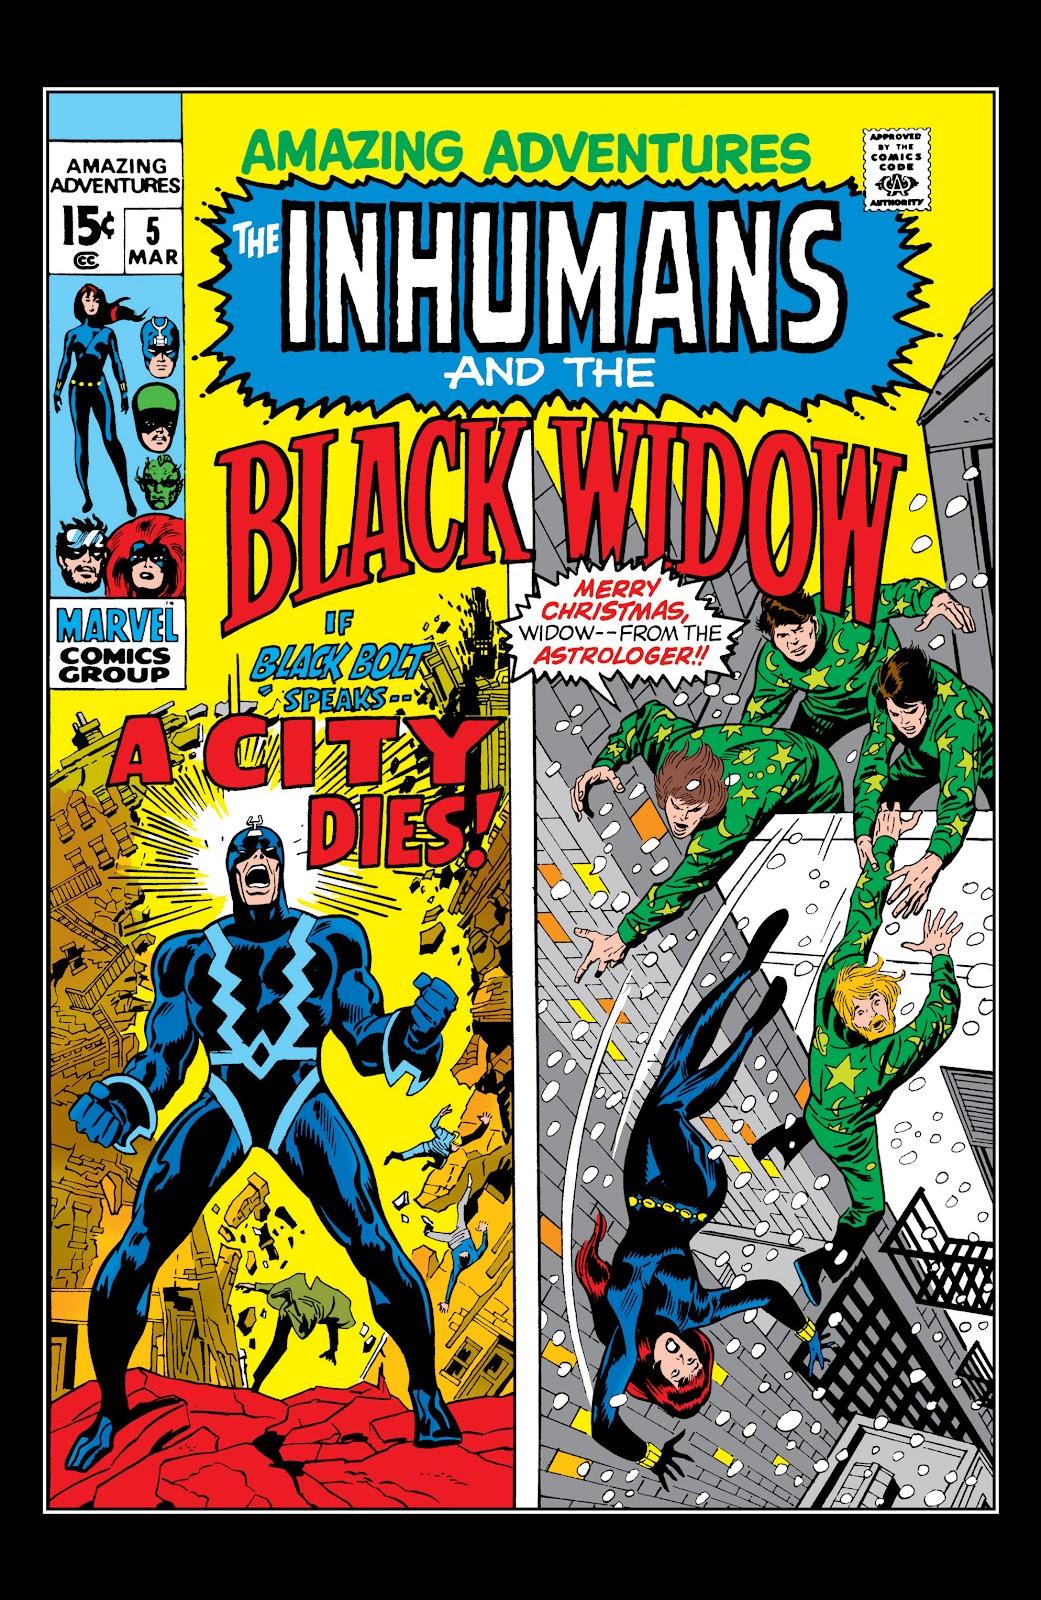 Read online Marvel Masterworks: The Inhumans comic -  Issue # TPB 1 (Part 2) - 13